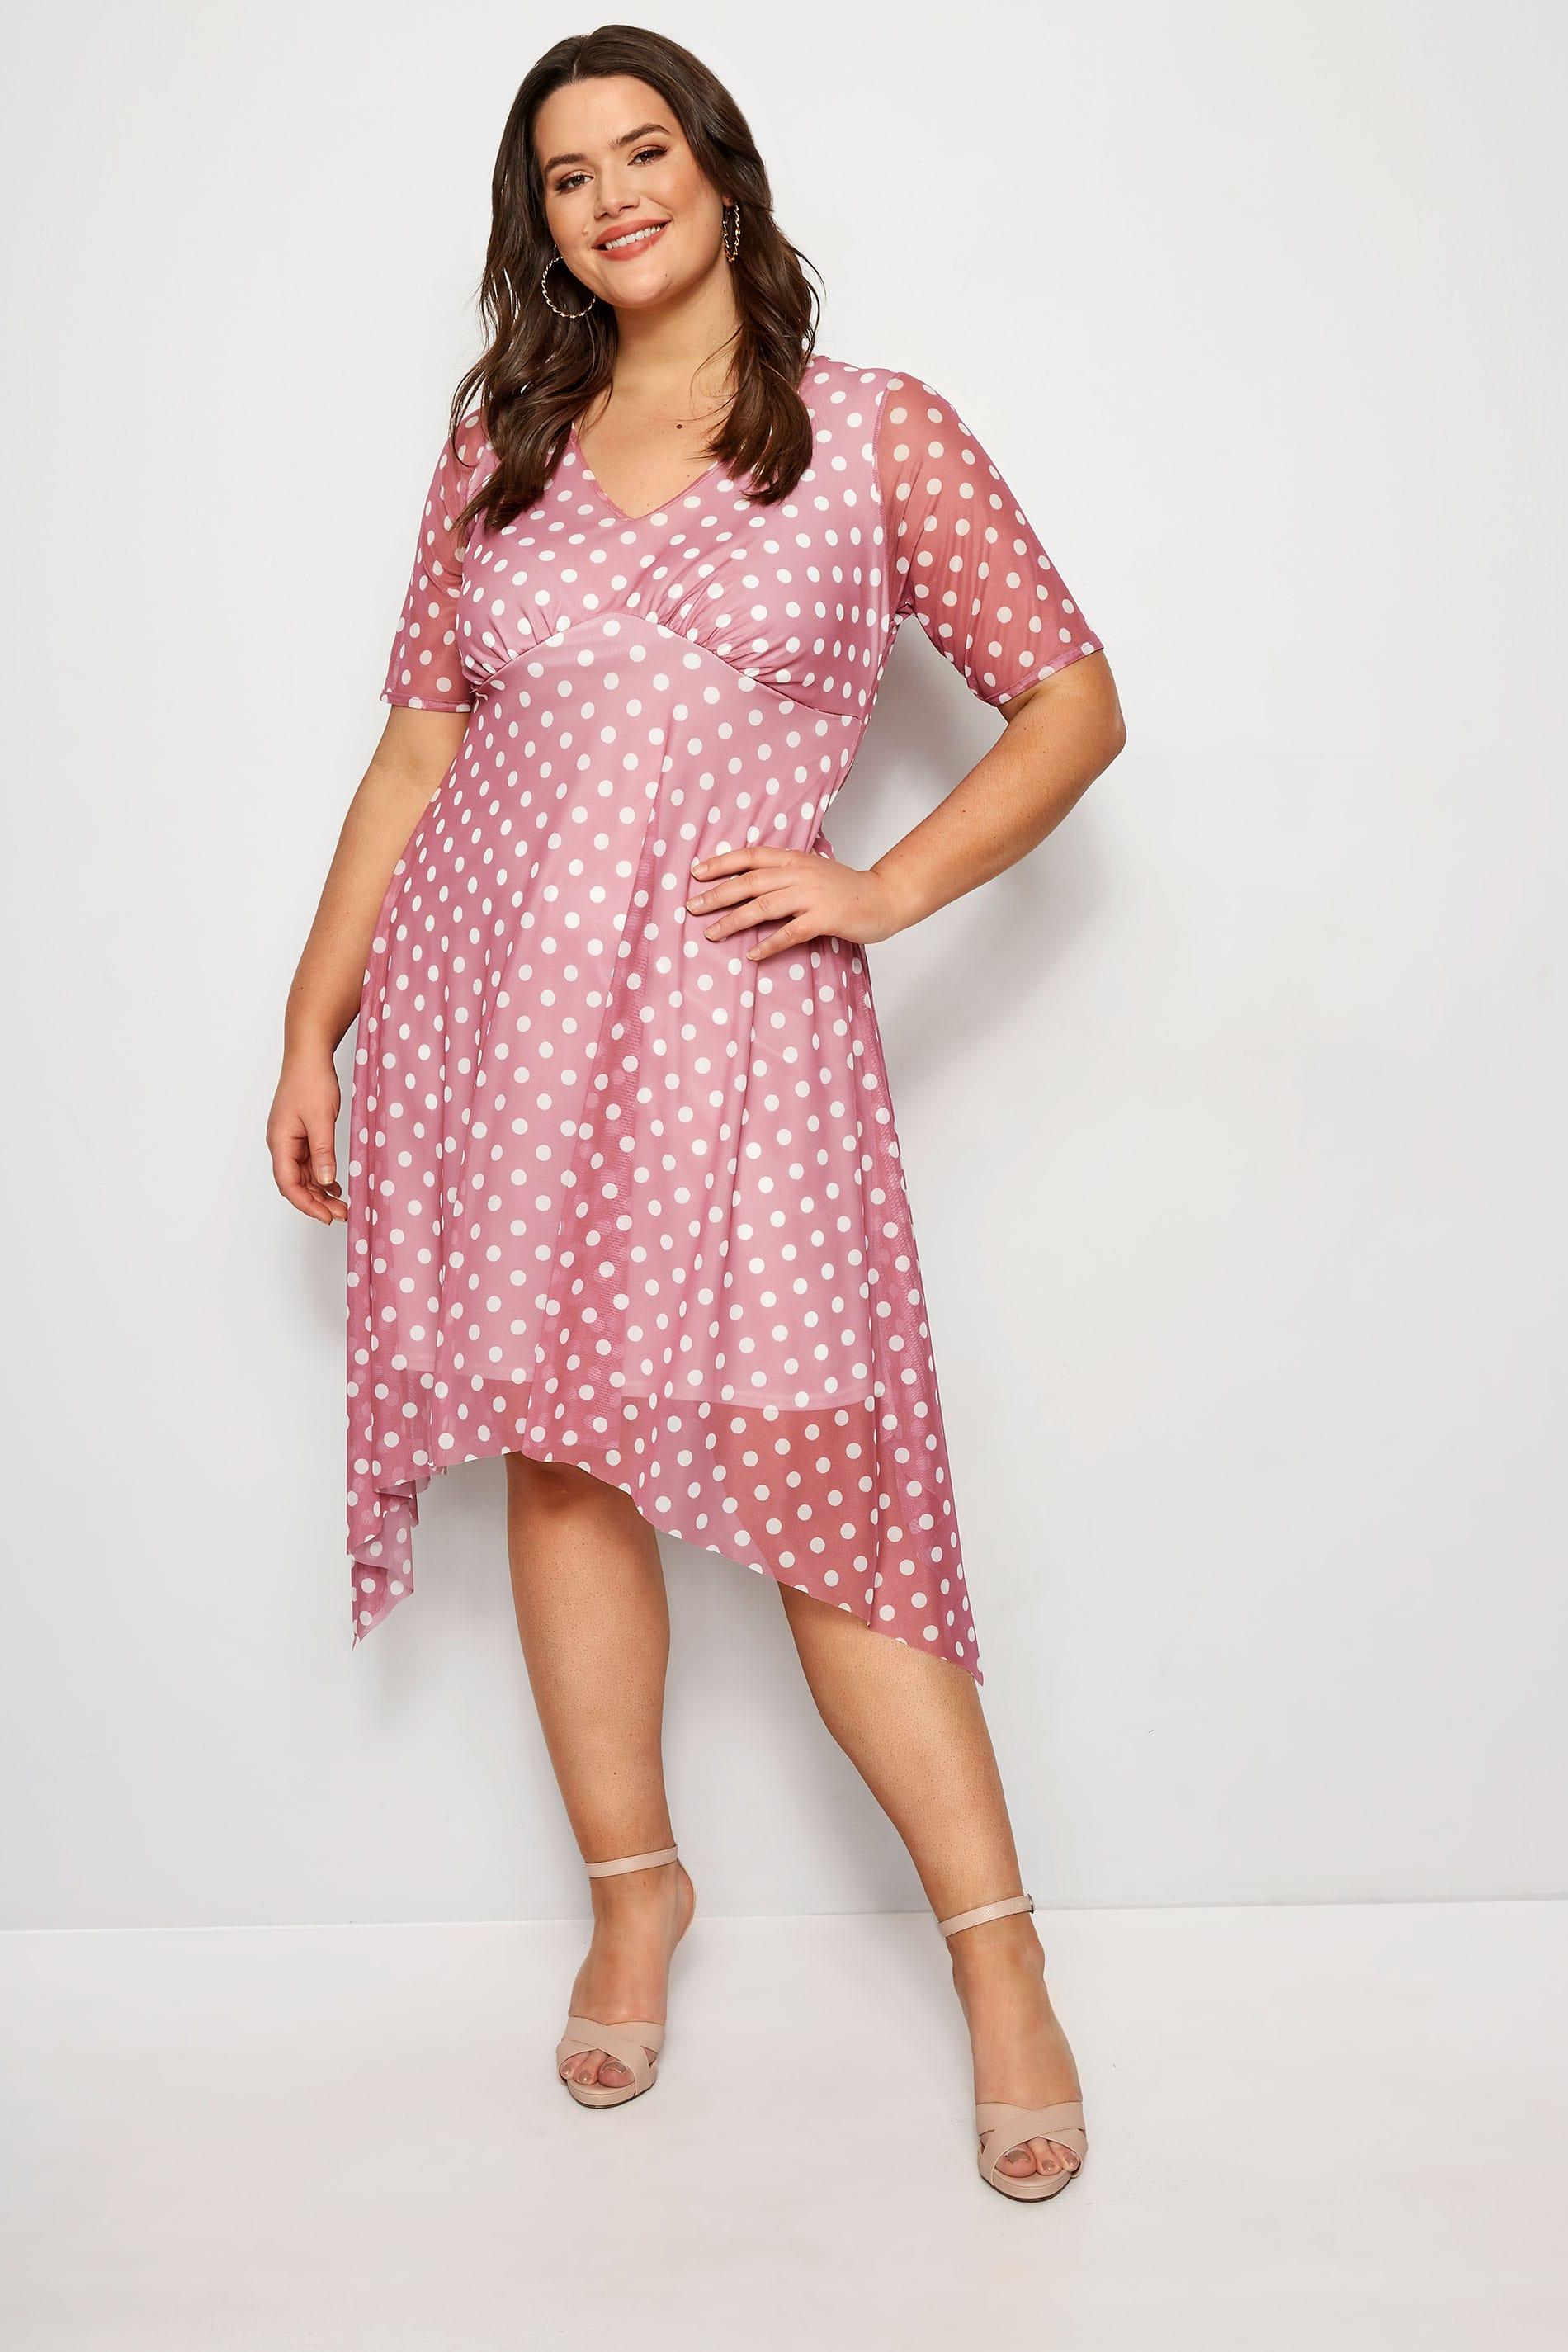 yours london midi-kleid - rosa, große größen 44 bis 60